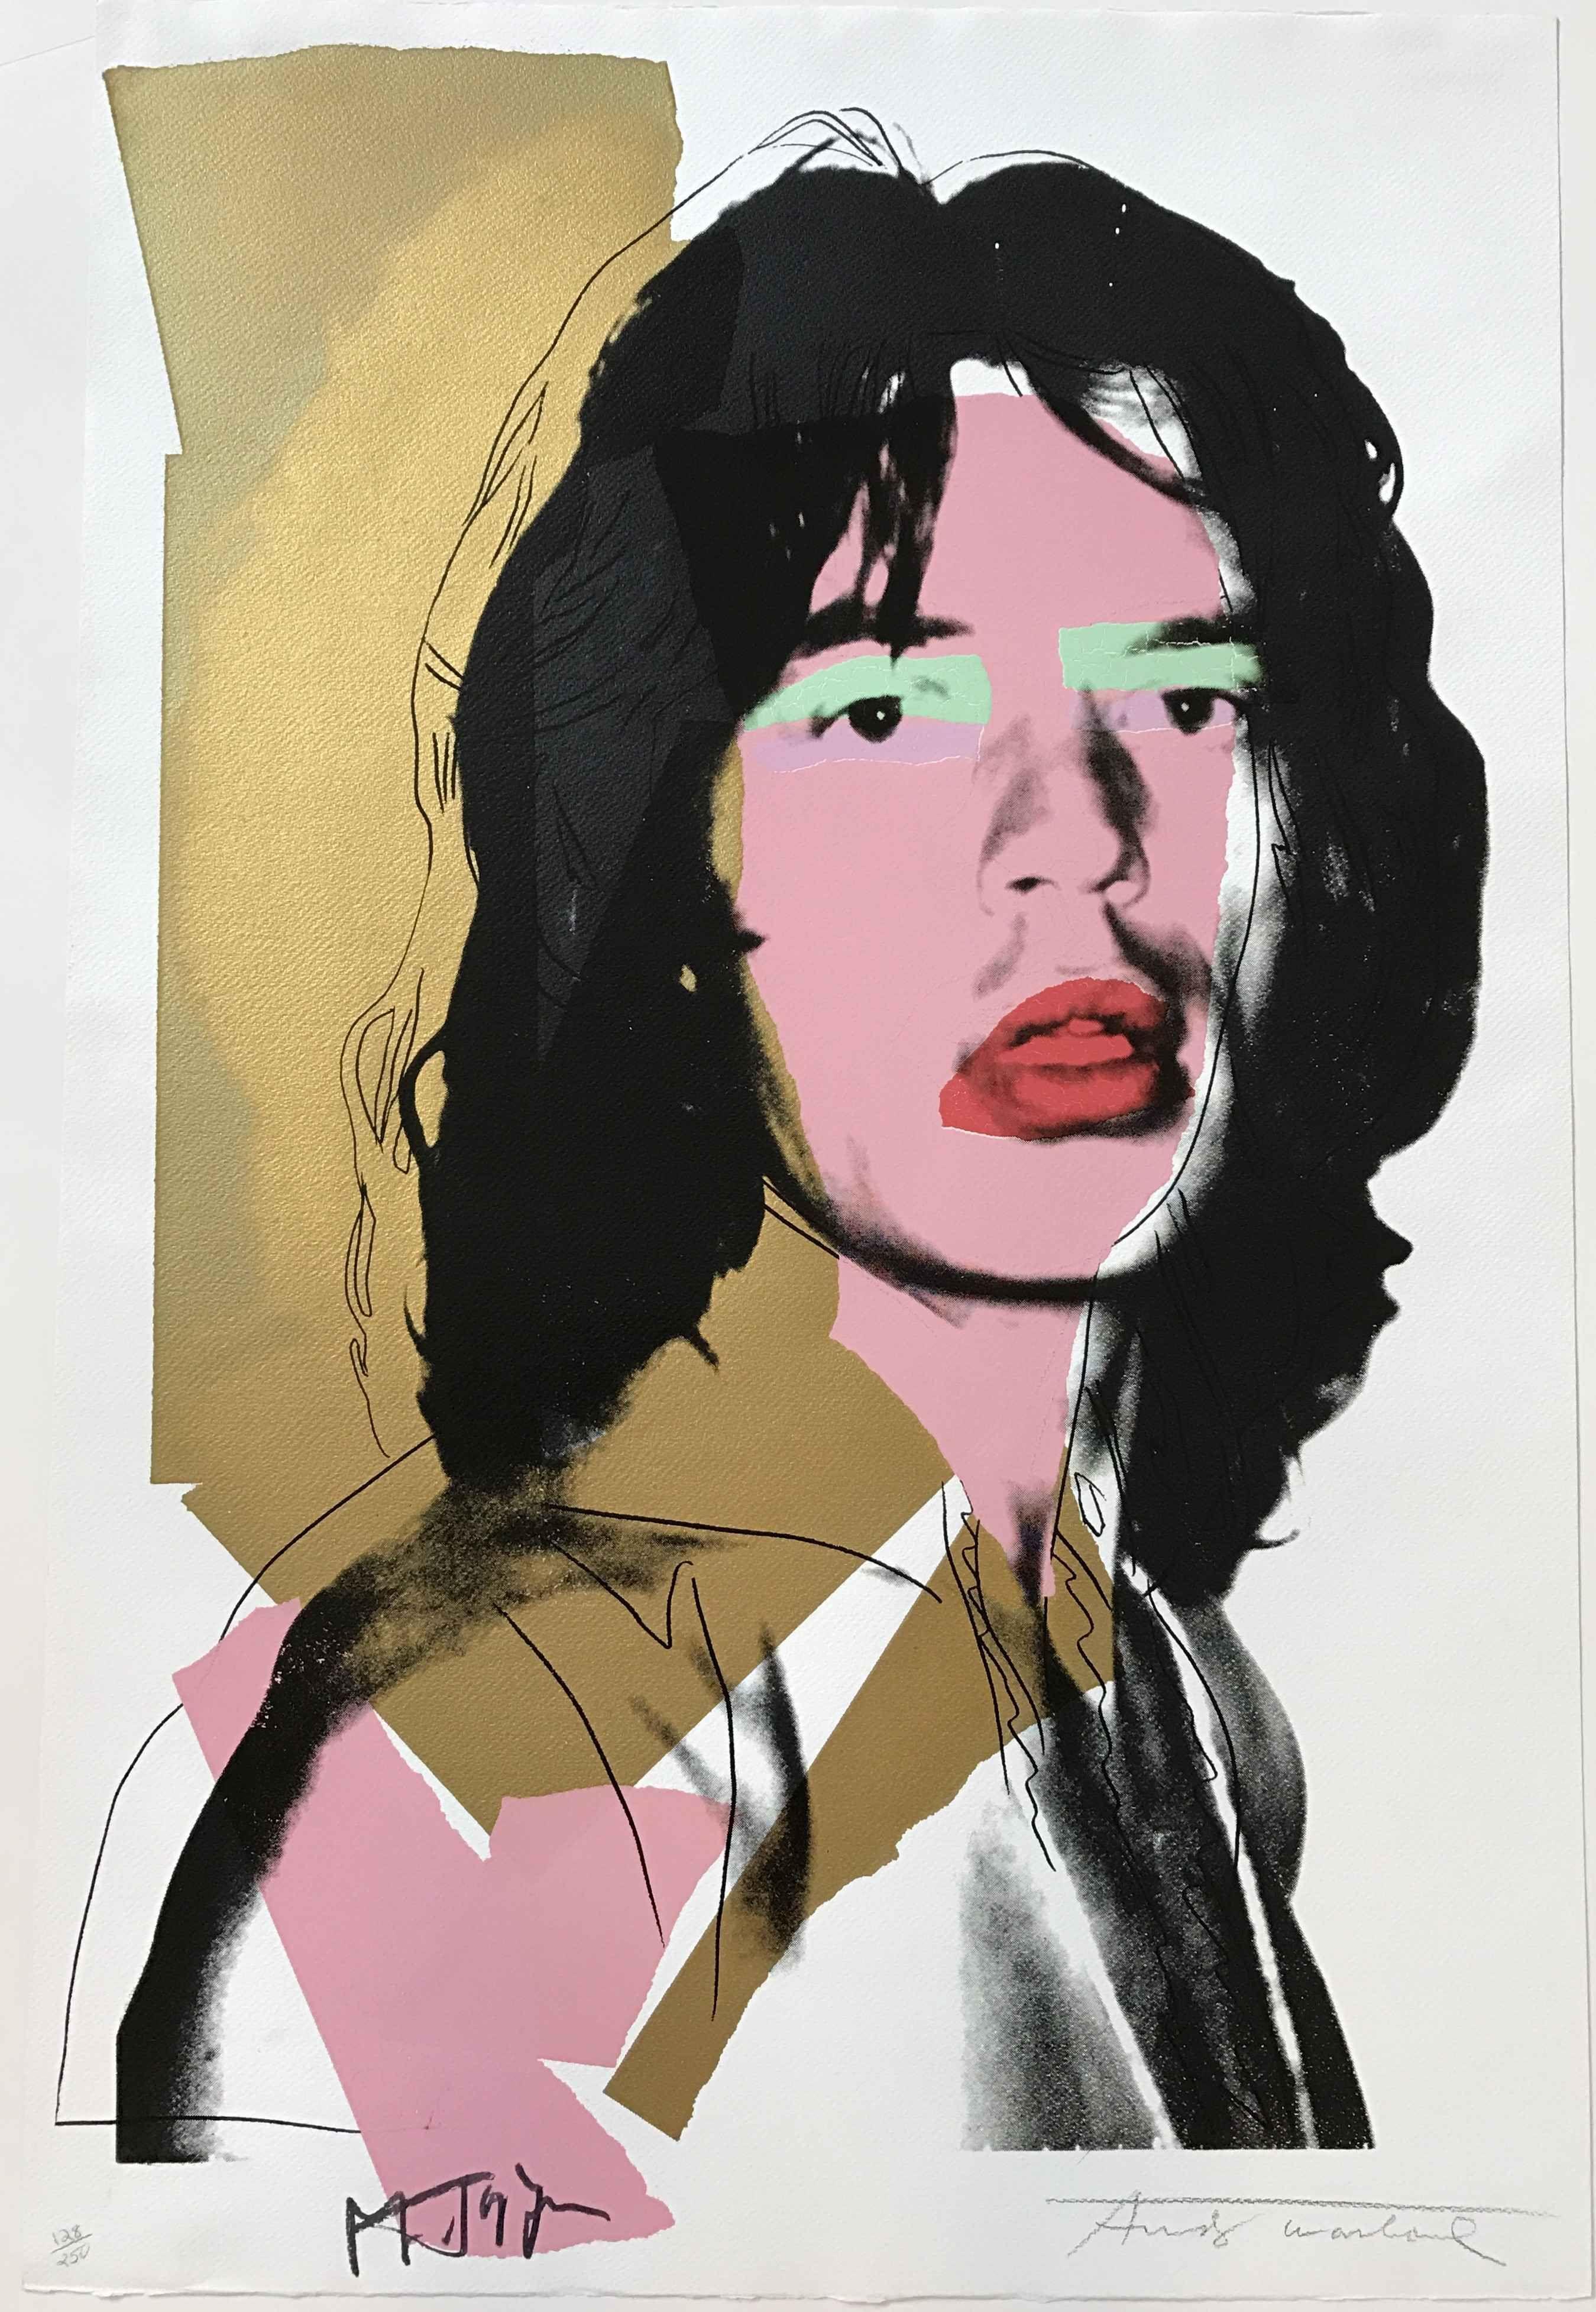 andy warhol art - HD1420×2150